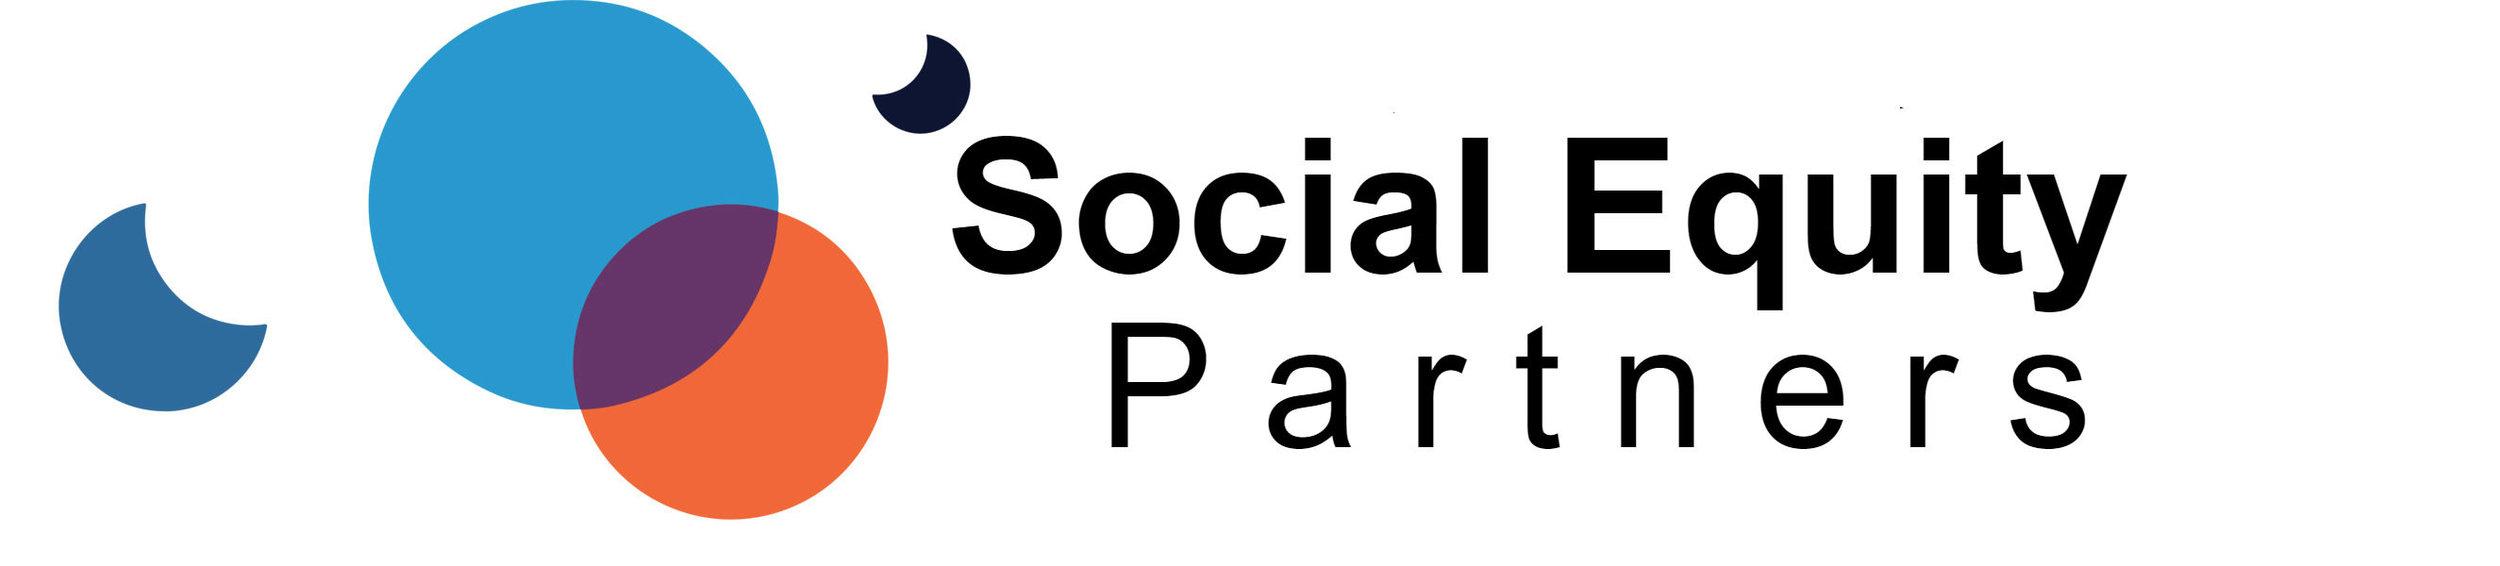 social equity partners .jpg